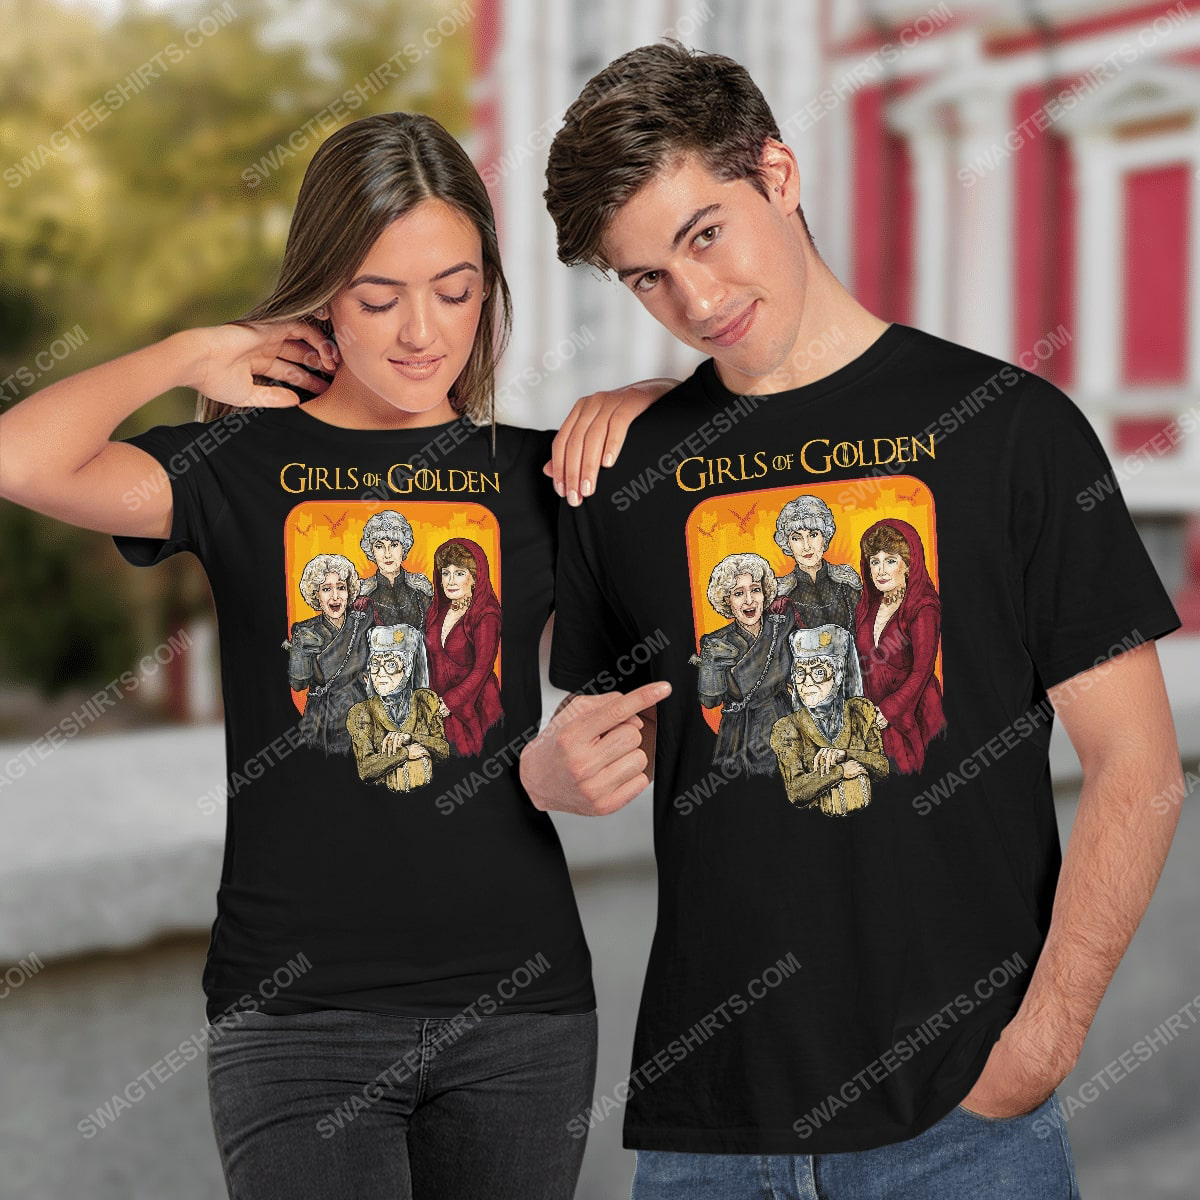 Game of thrones and the golden girls girls of golden shirt 2(1)